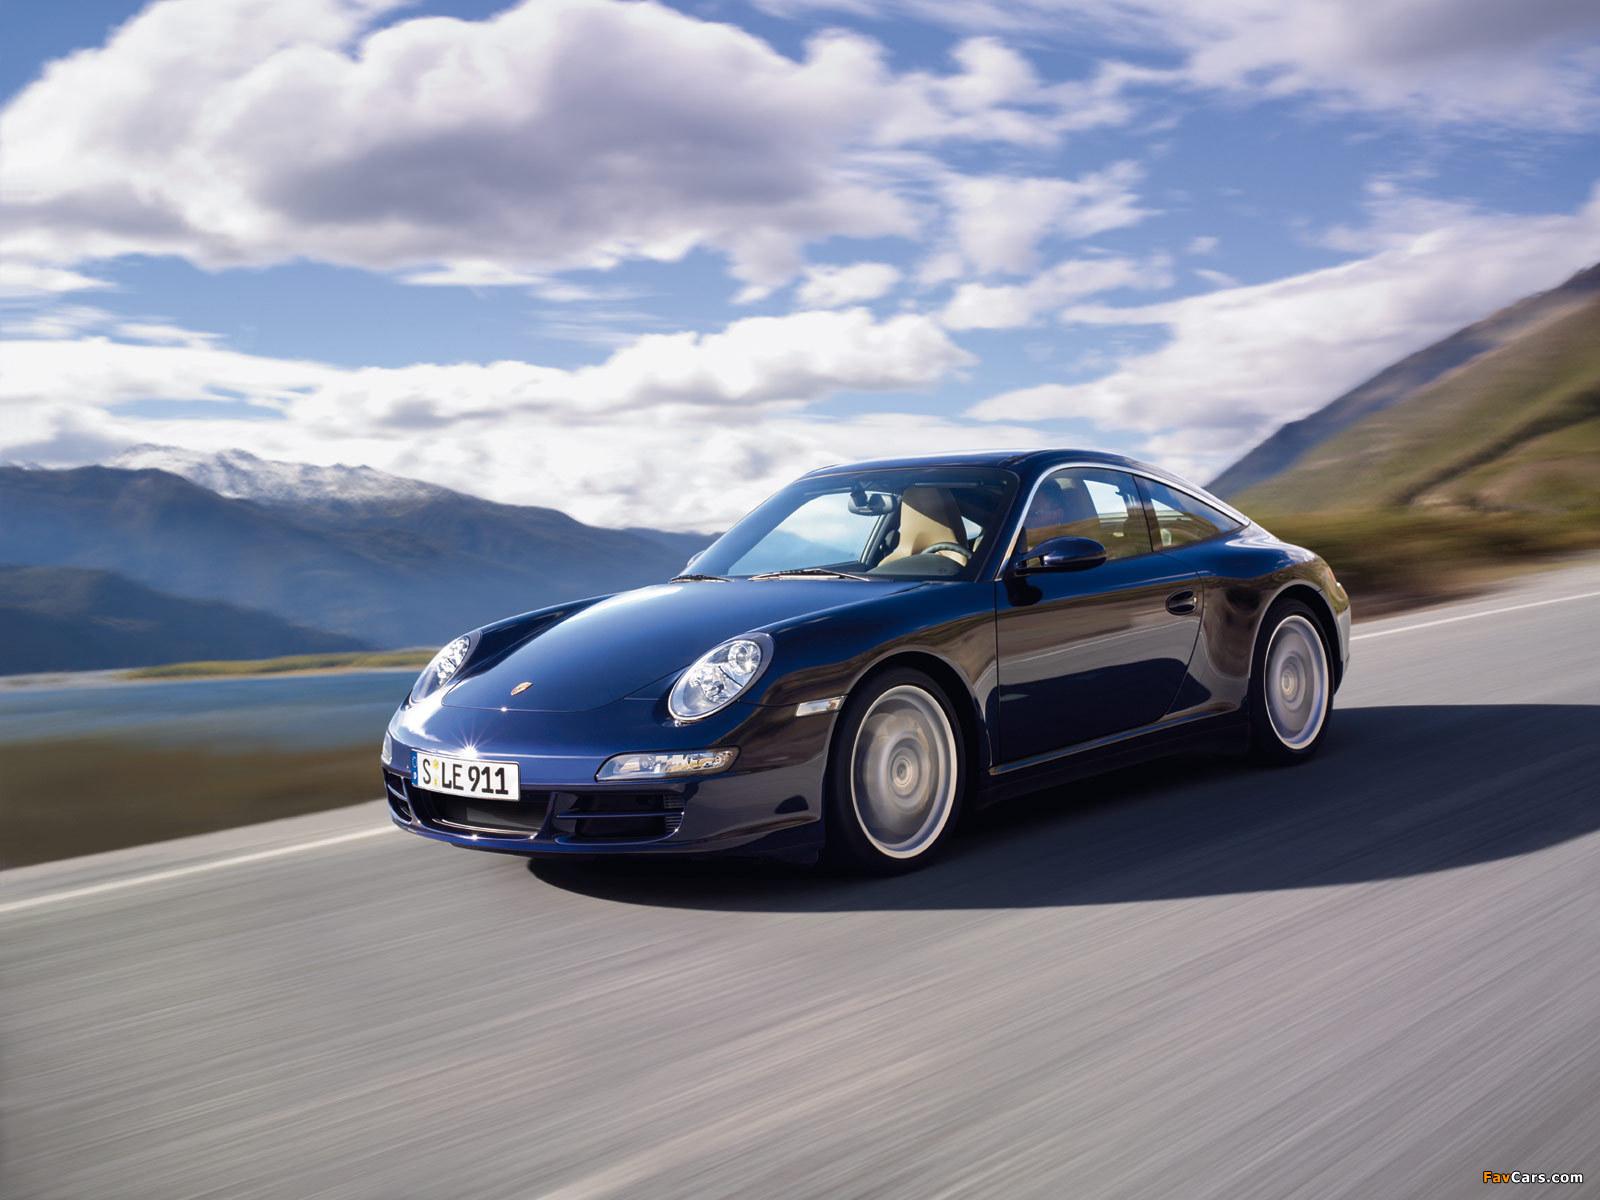 Porsche 911 Targa 4s 997 2005 08 Wallpapers 1600x1200